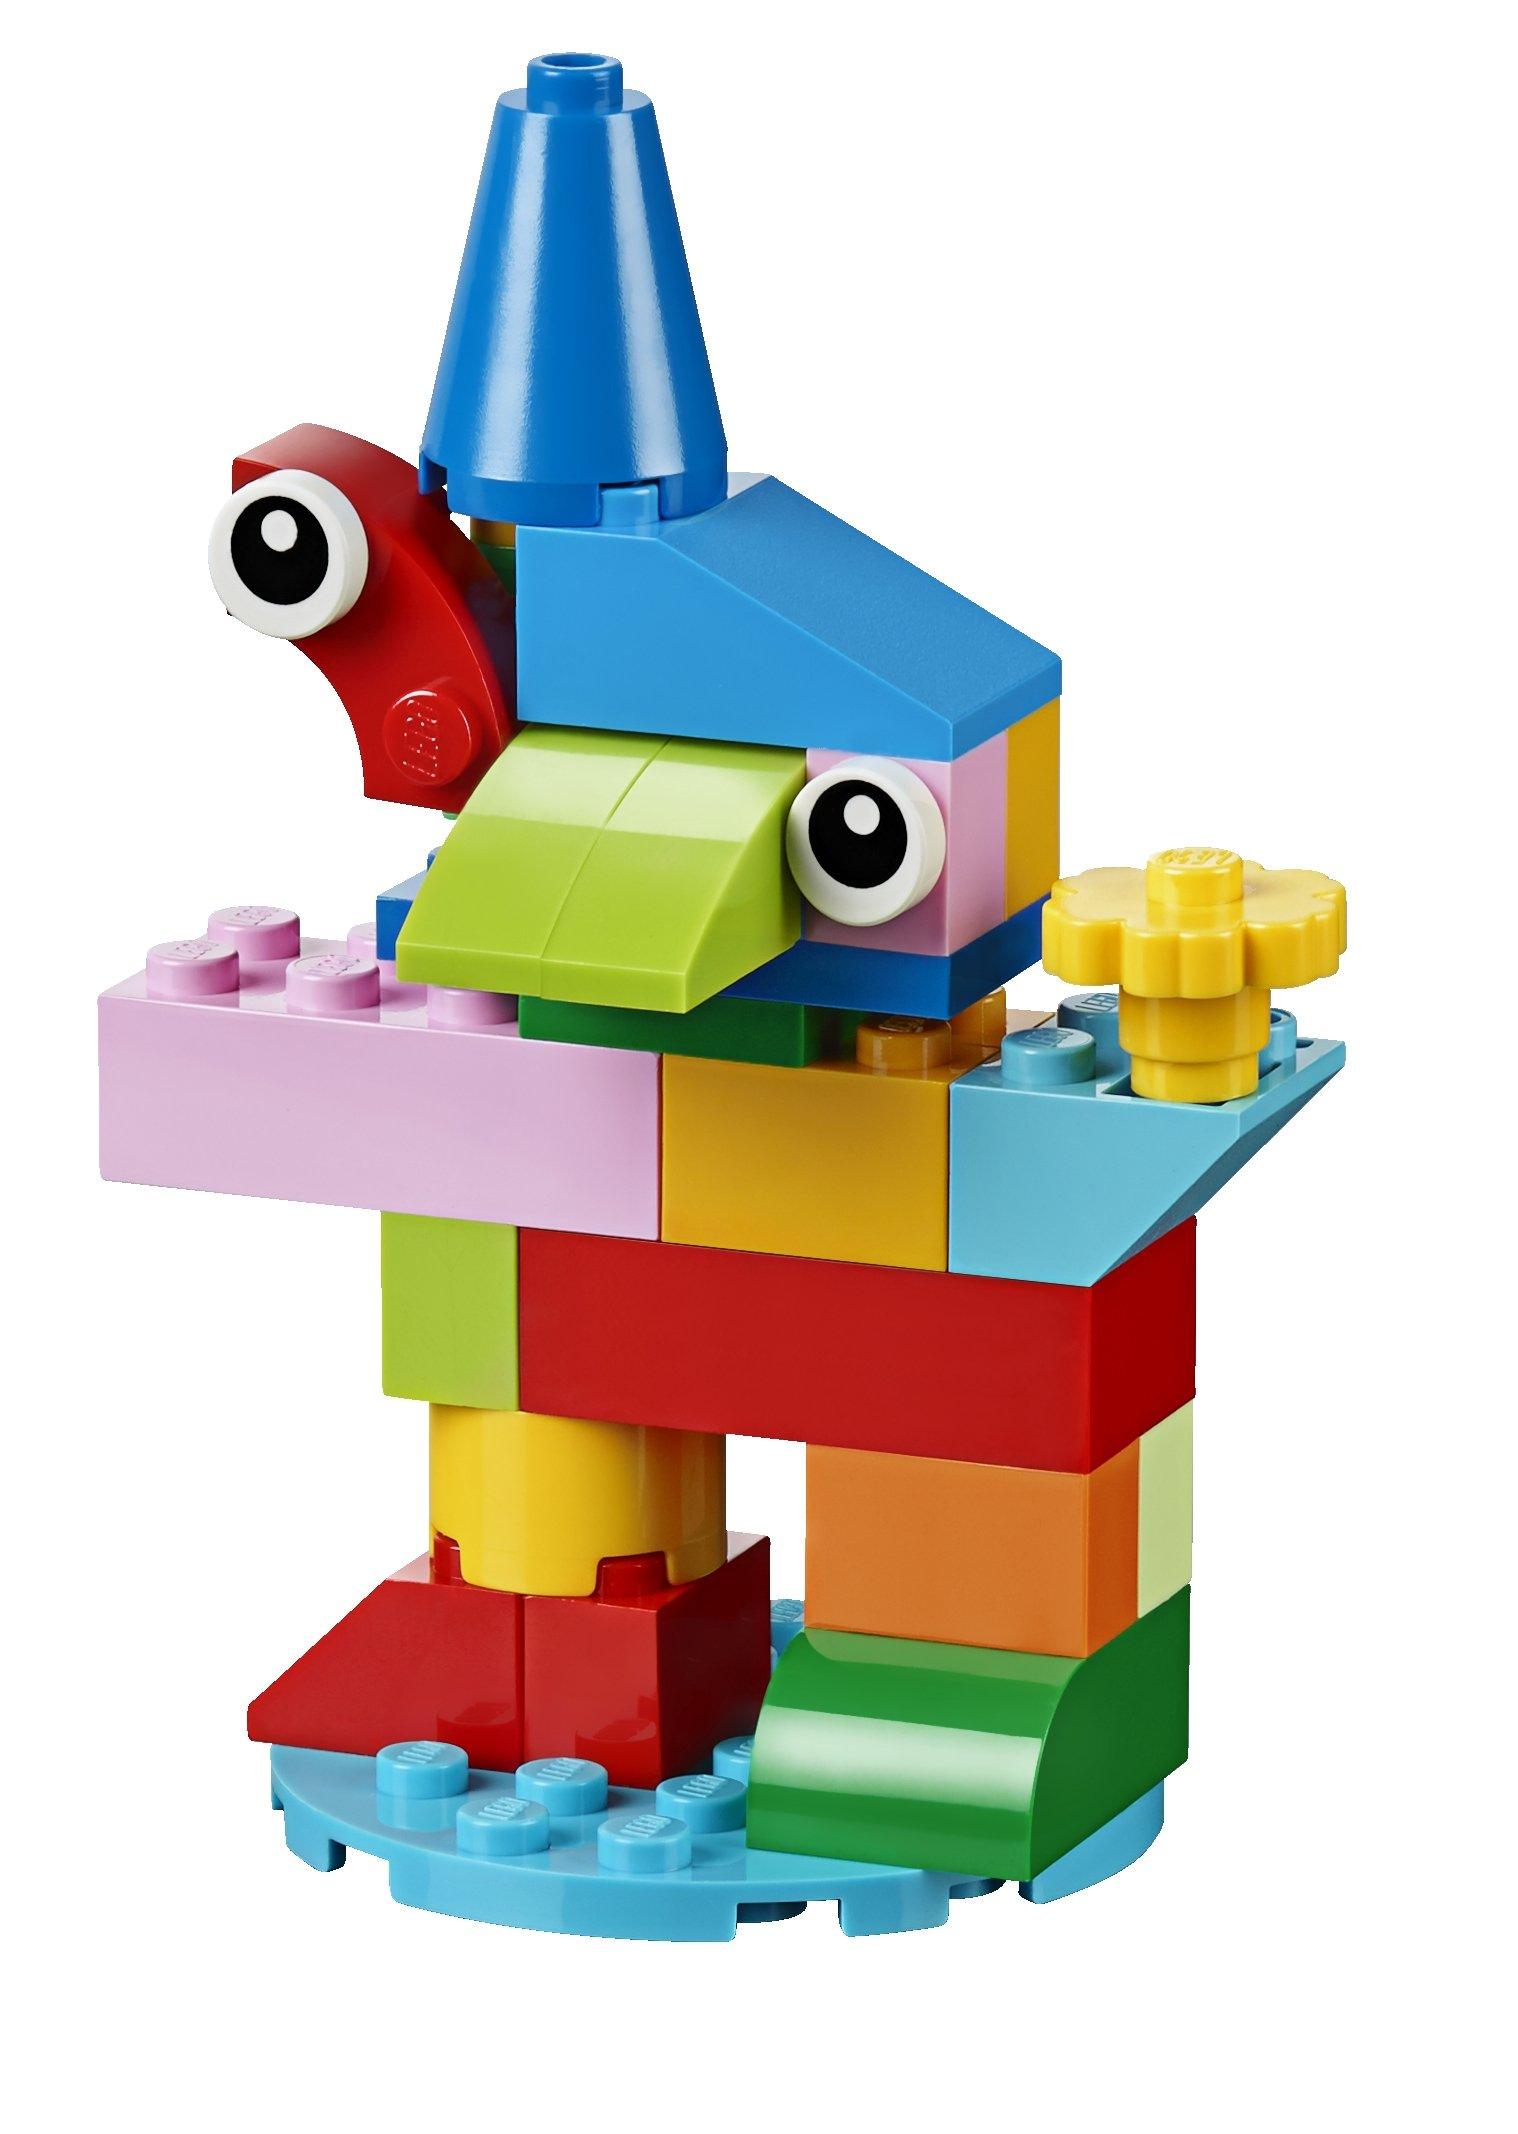 LEGO Classic Creative Bricks 10692 Building Blocks, Learning Toy by LEGO (Image #6)